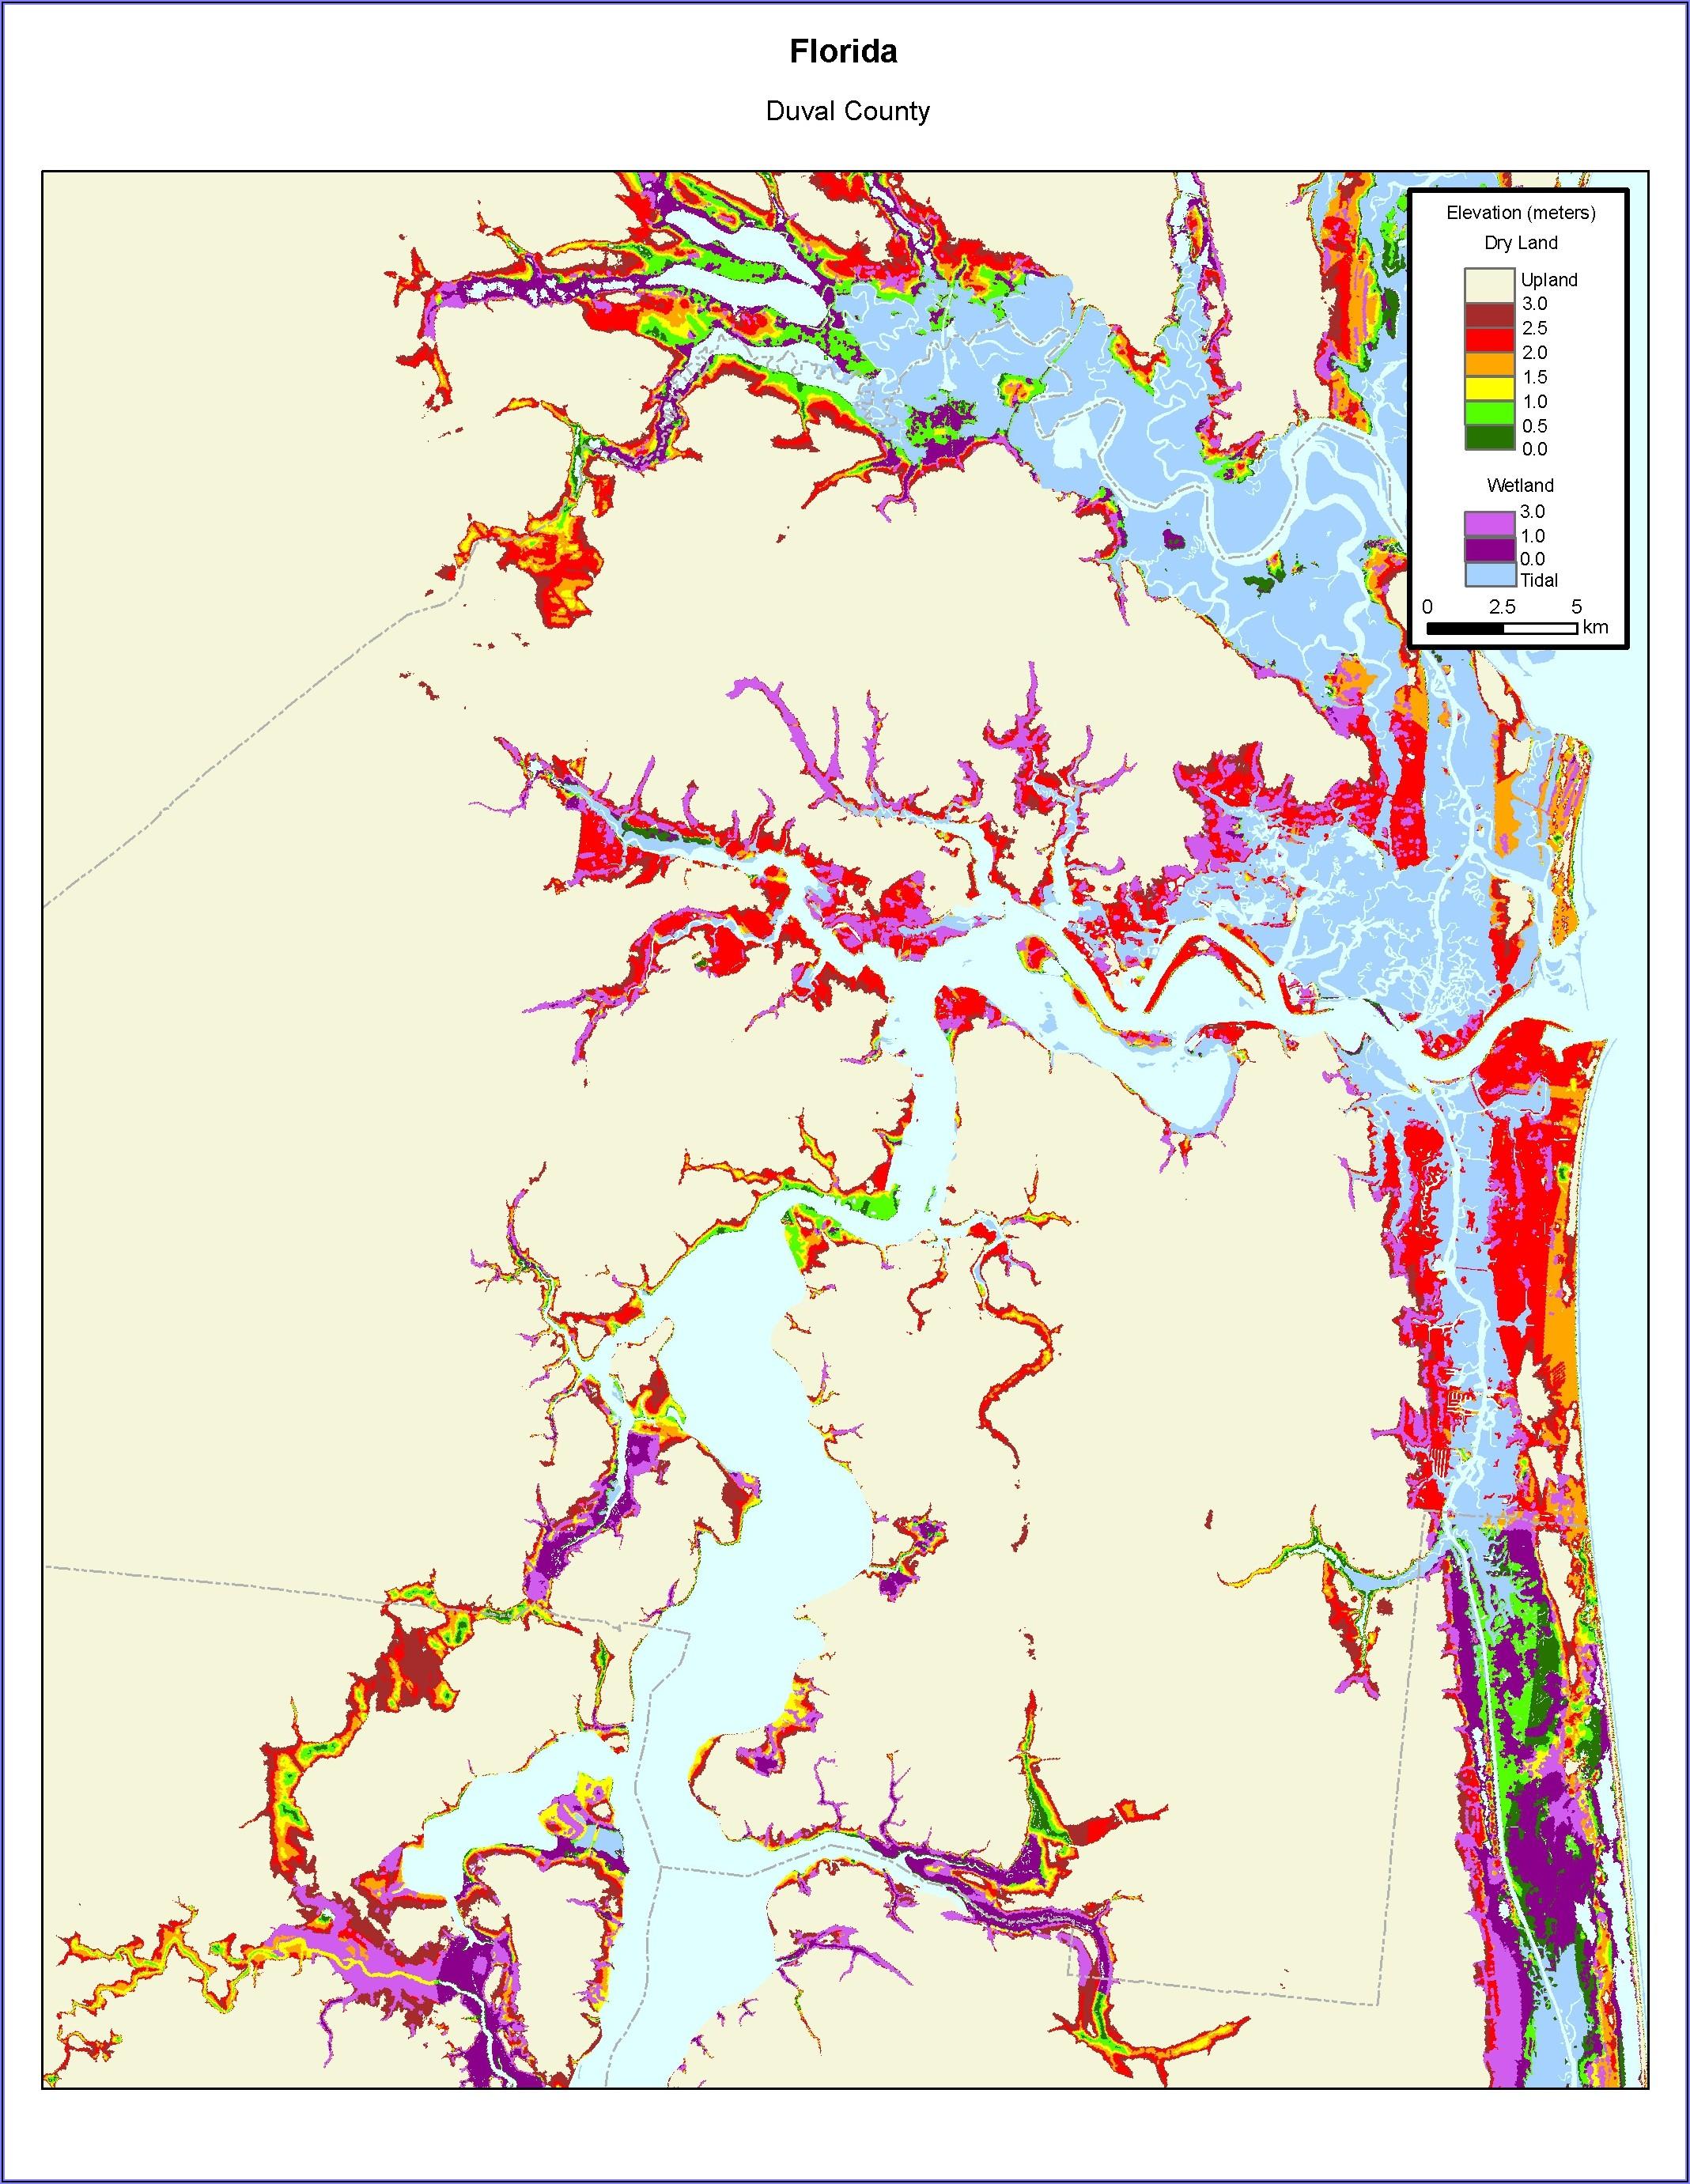 Fema Flood Zone Map Duval County Florida